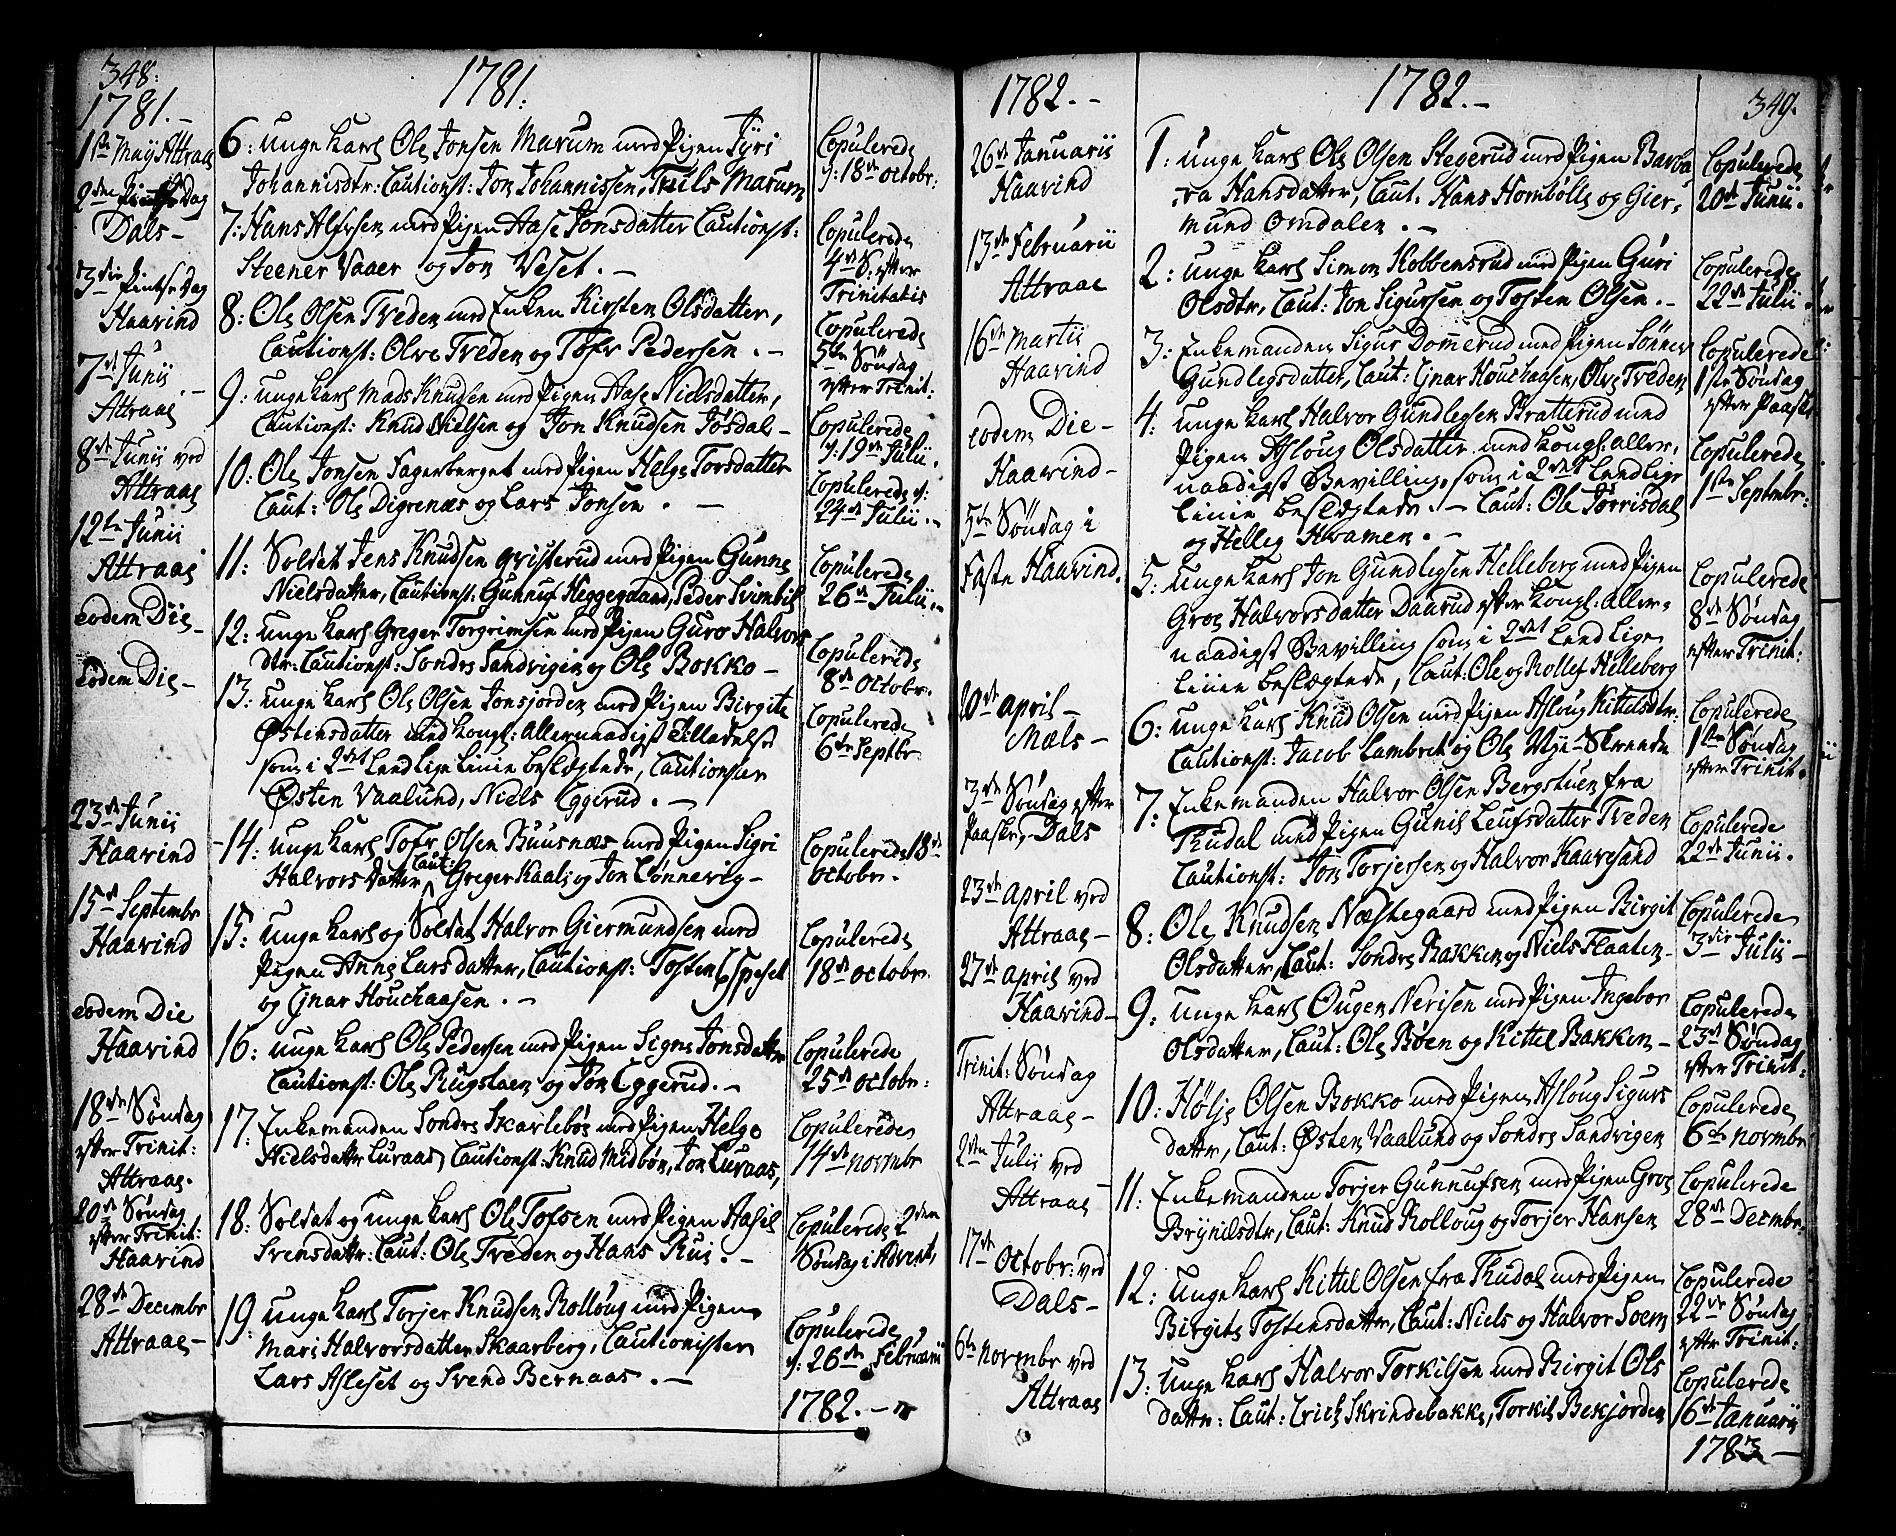 SAKO, Tinn kirkebøker, F/Fa/L0002: Ministerialbok nr. I 2, 1757-1810, s. 348-349